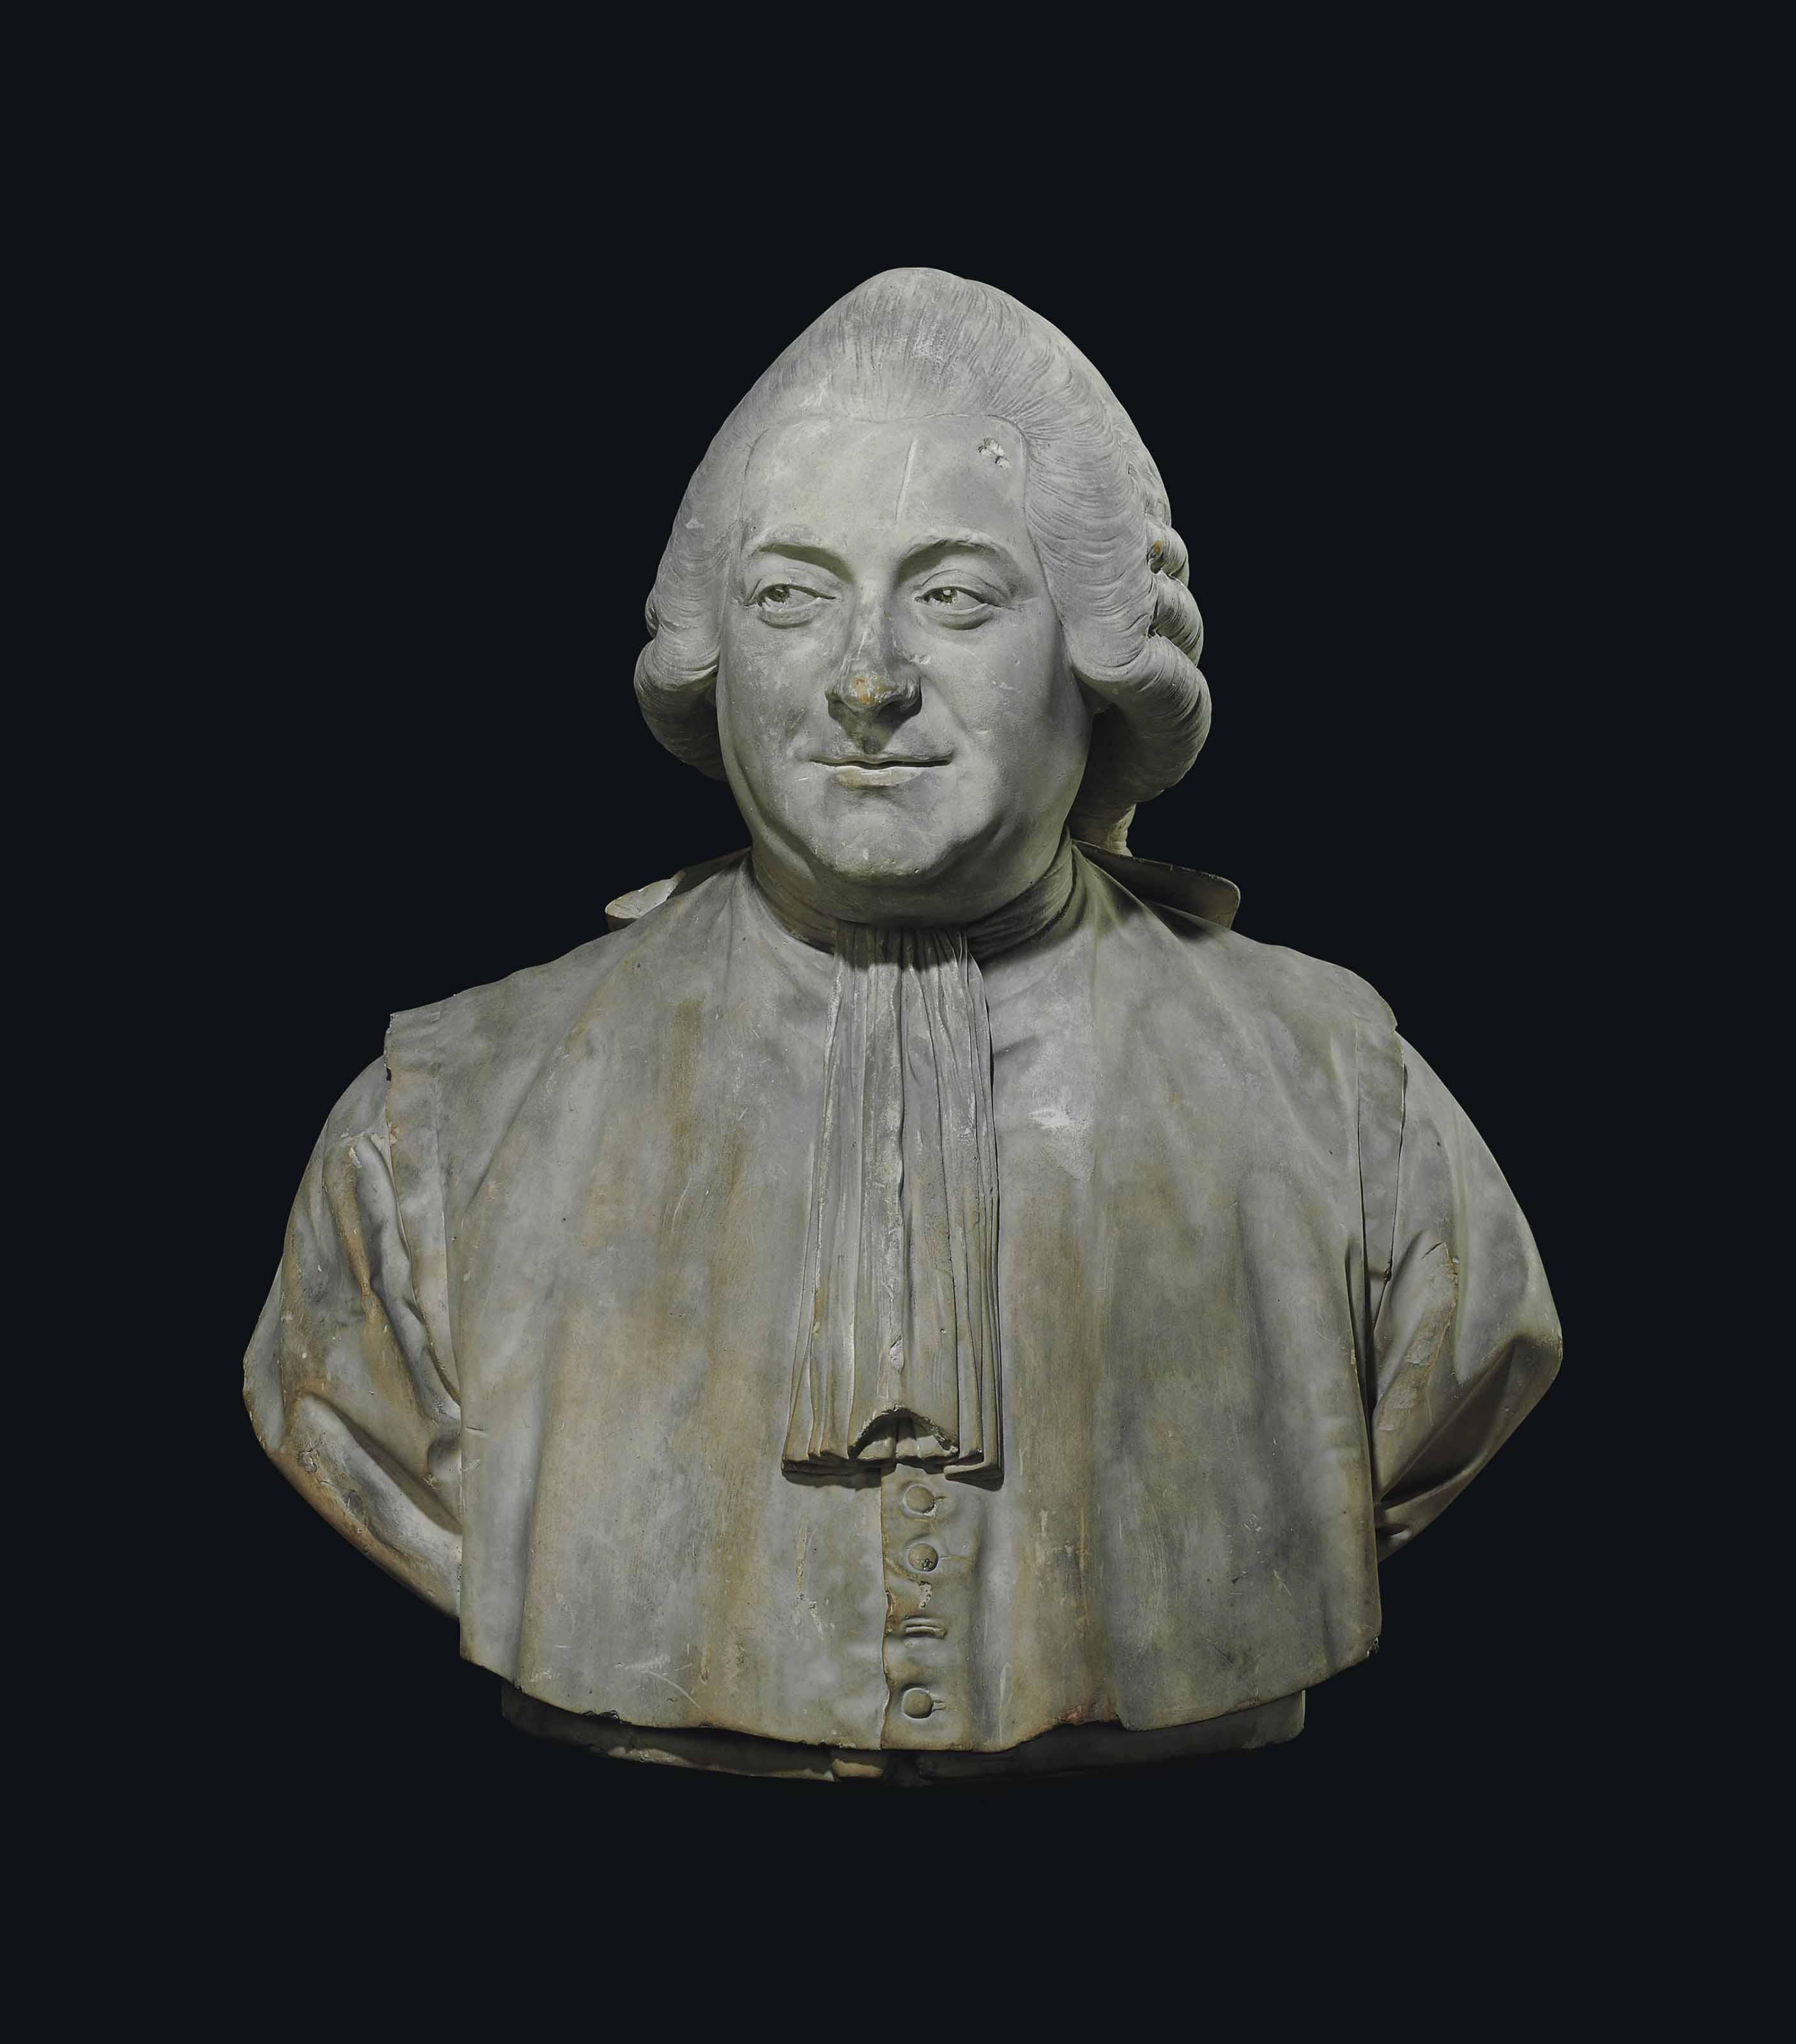 A PLASTER BUST OF JEAN-PIERRE-CHARLES LE NOIR (1732-1807)